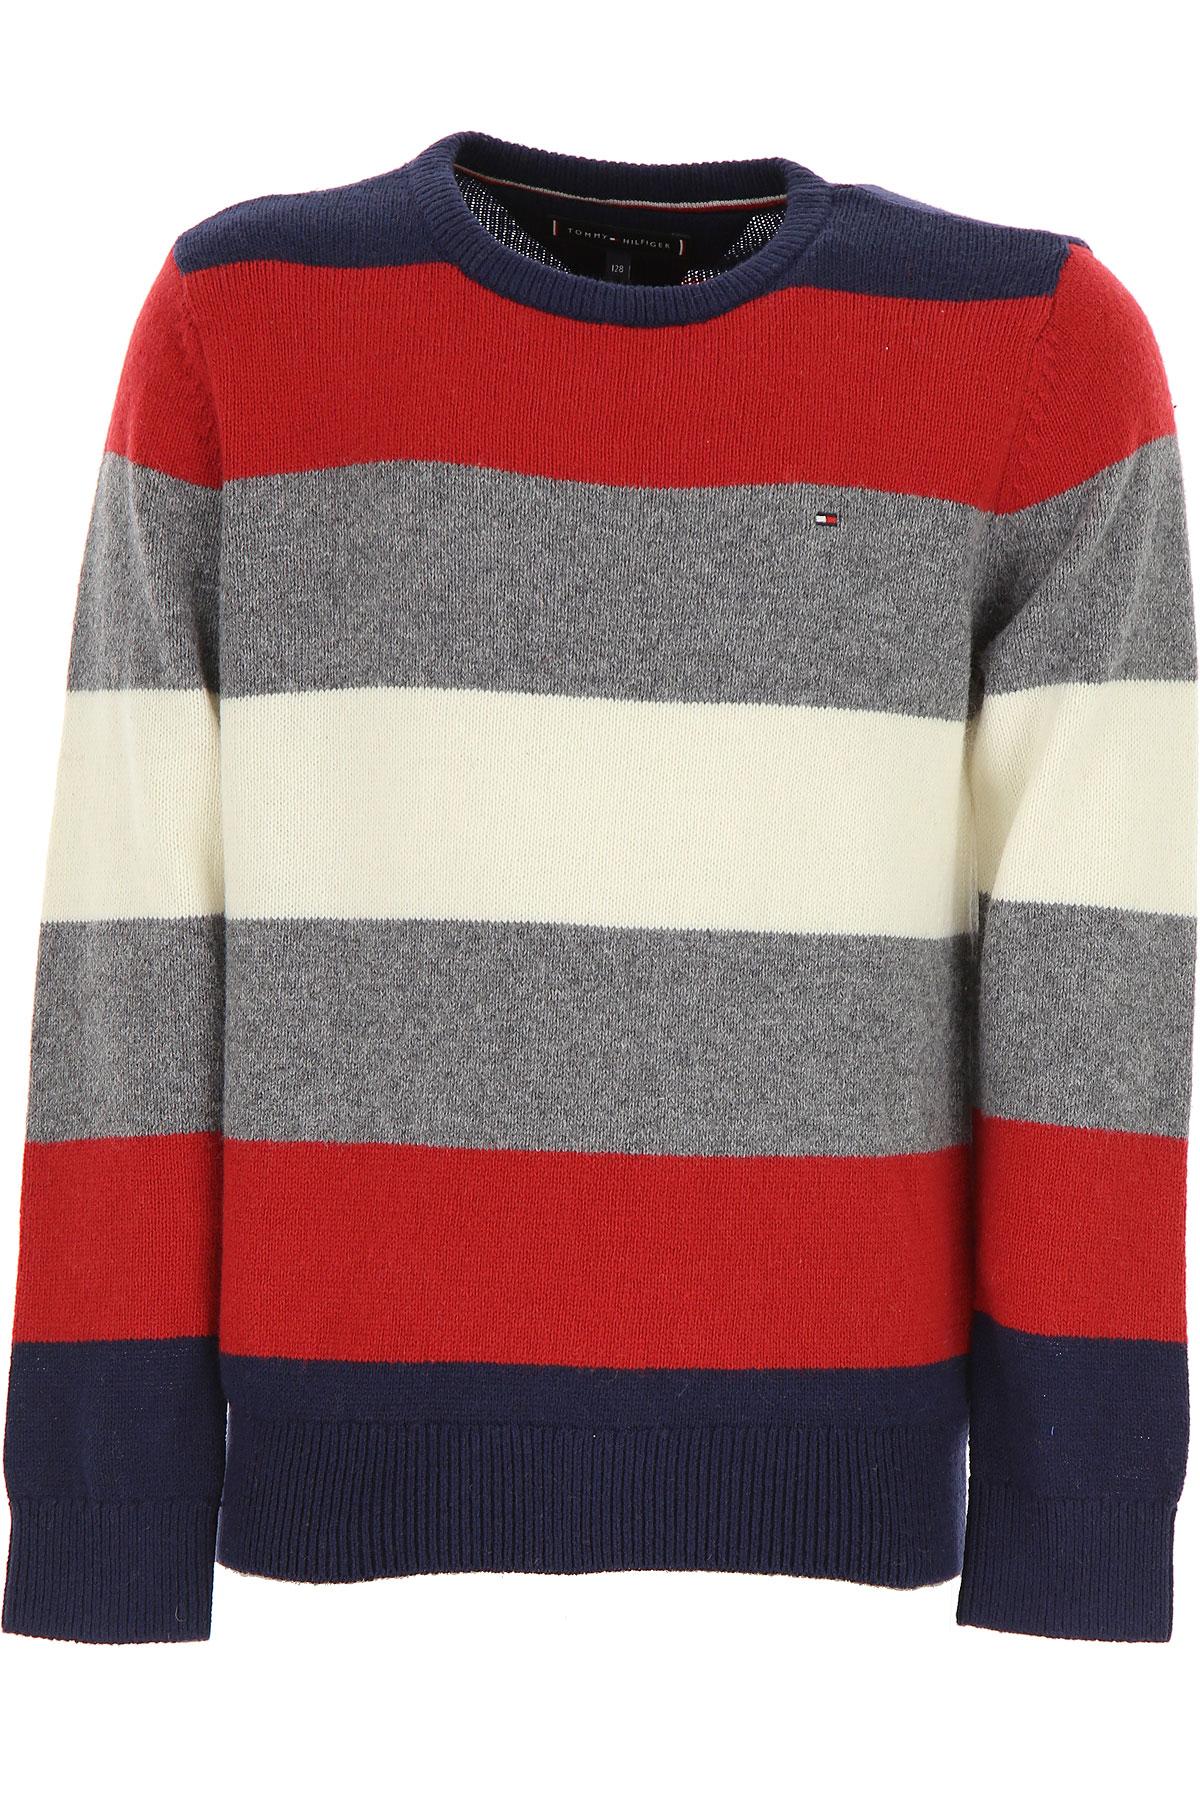 Tommy Hilfiger Kids Sweaters for Boys, Blue, Cotton, 2017, 10Y 14Y 16Y 2Y 4Y 6Y 8Y USA-479373